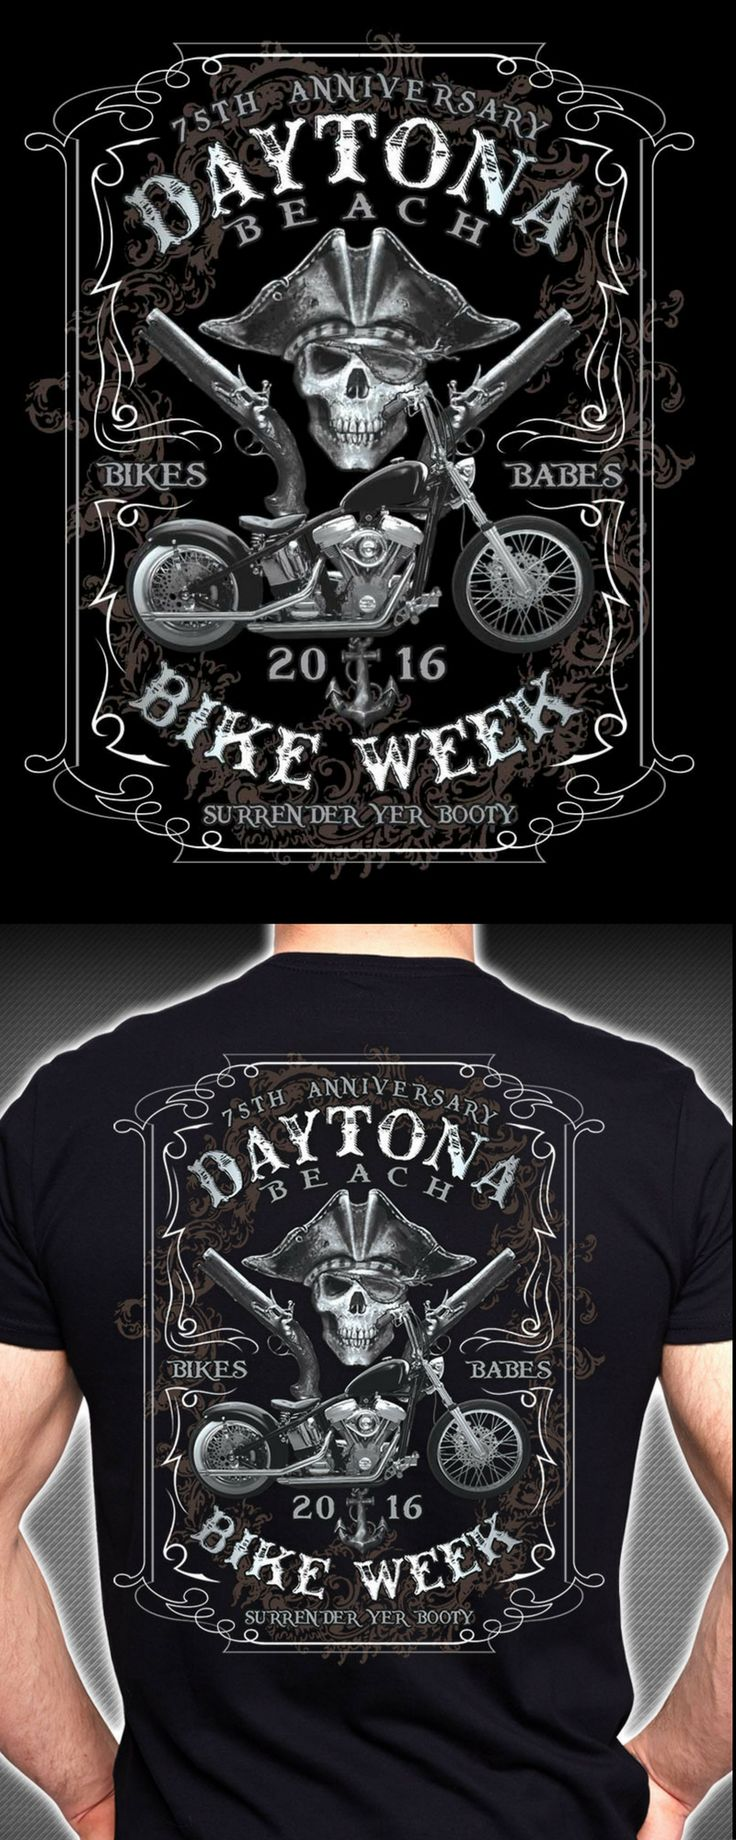 Shirt design history - 2016 Daytona Beach Bike Week Pirate Skull Anniversary Collector S Edition Own A Piece Of History With This Anniversary Daytona Beach Bike Week Shirt Design